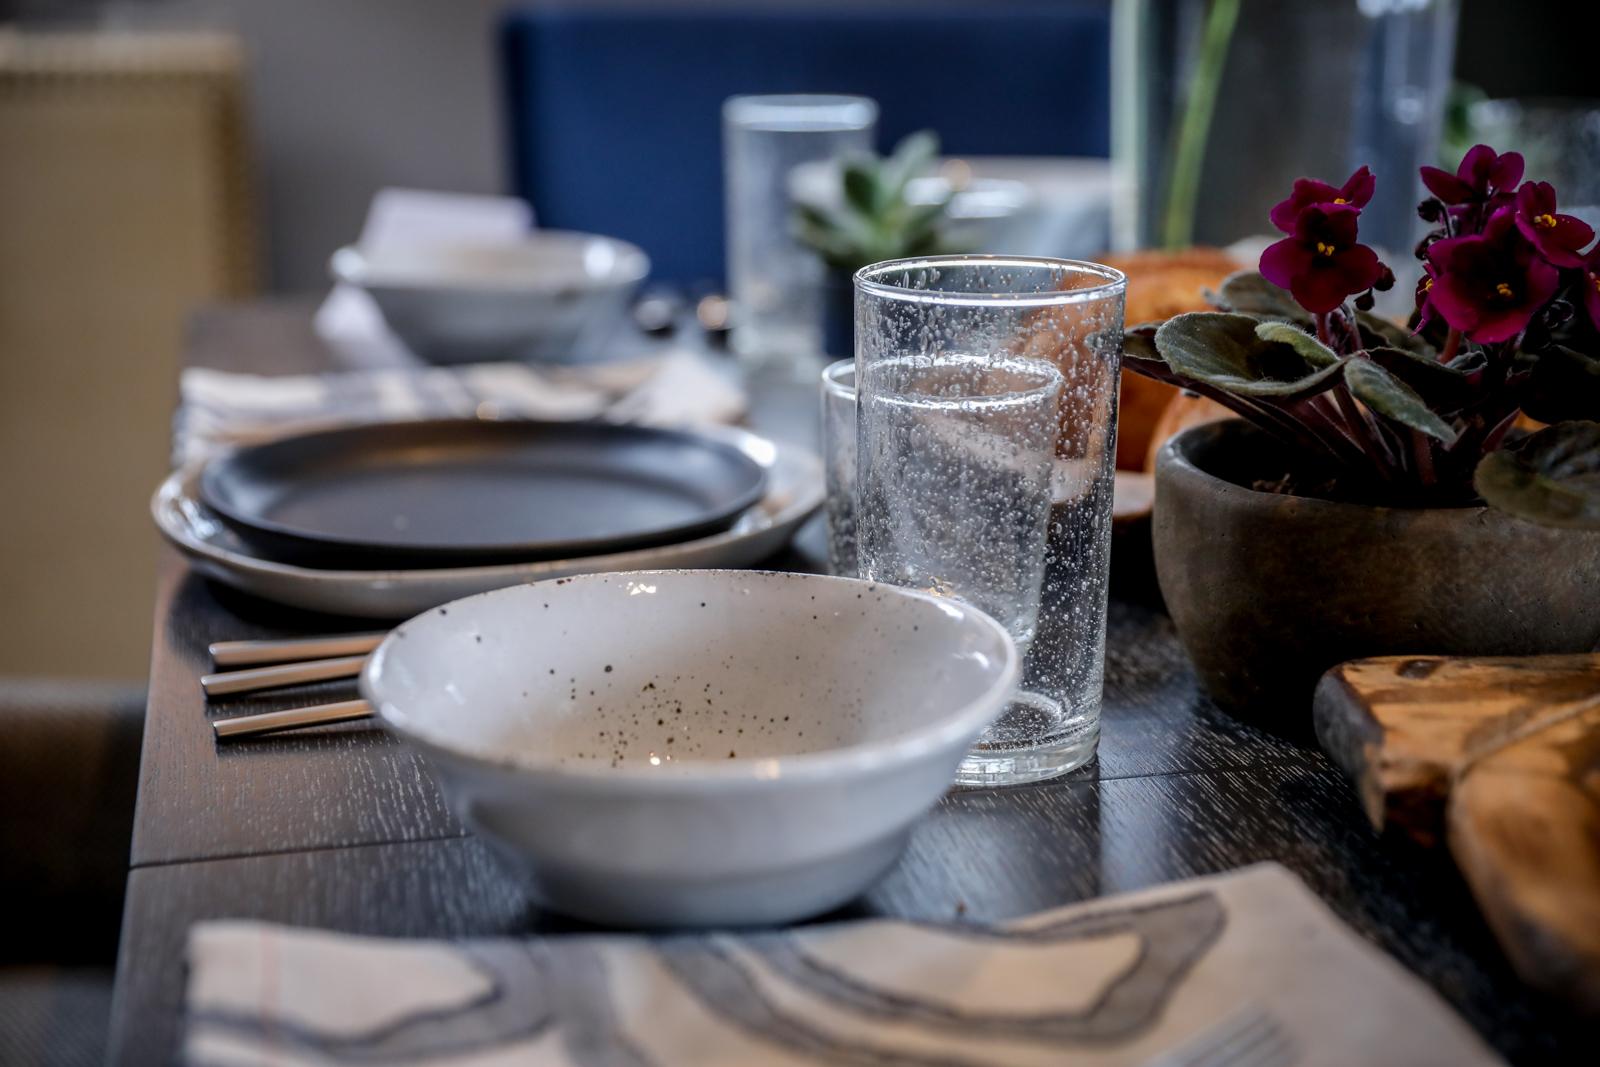 Rustic-Tablescape-Black-White-Bowl-Bubble-Glasses.jpg